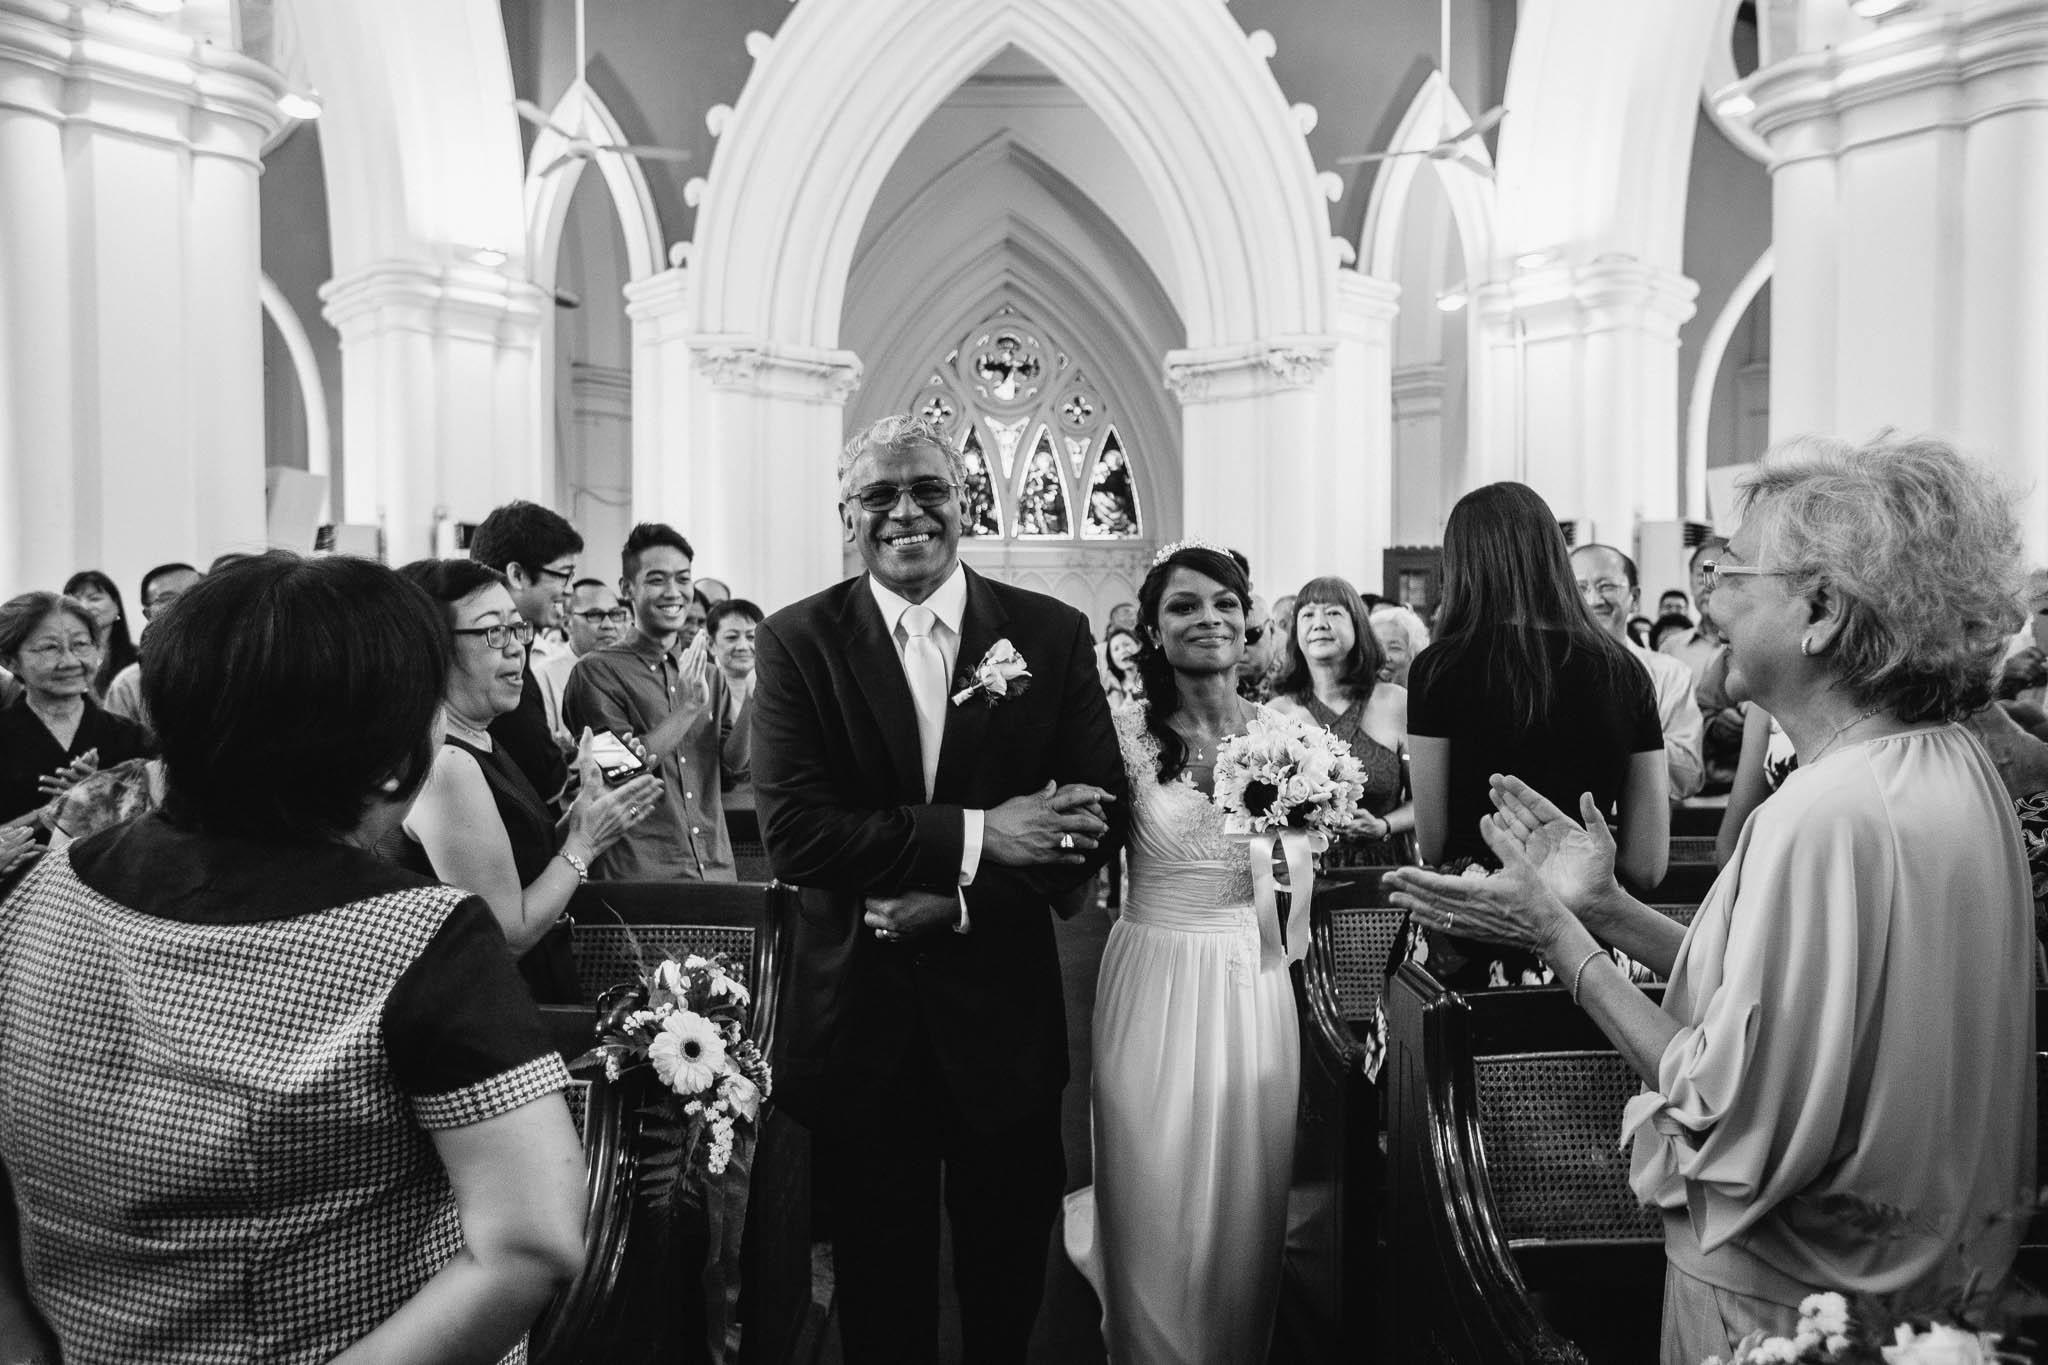 singapore-wedding-photographer-st-andrews-cathedral-renita-david-08.jpg